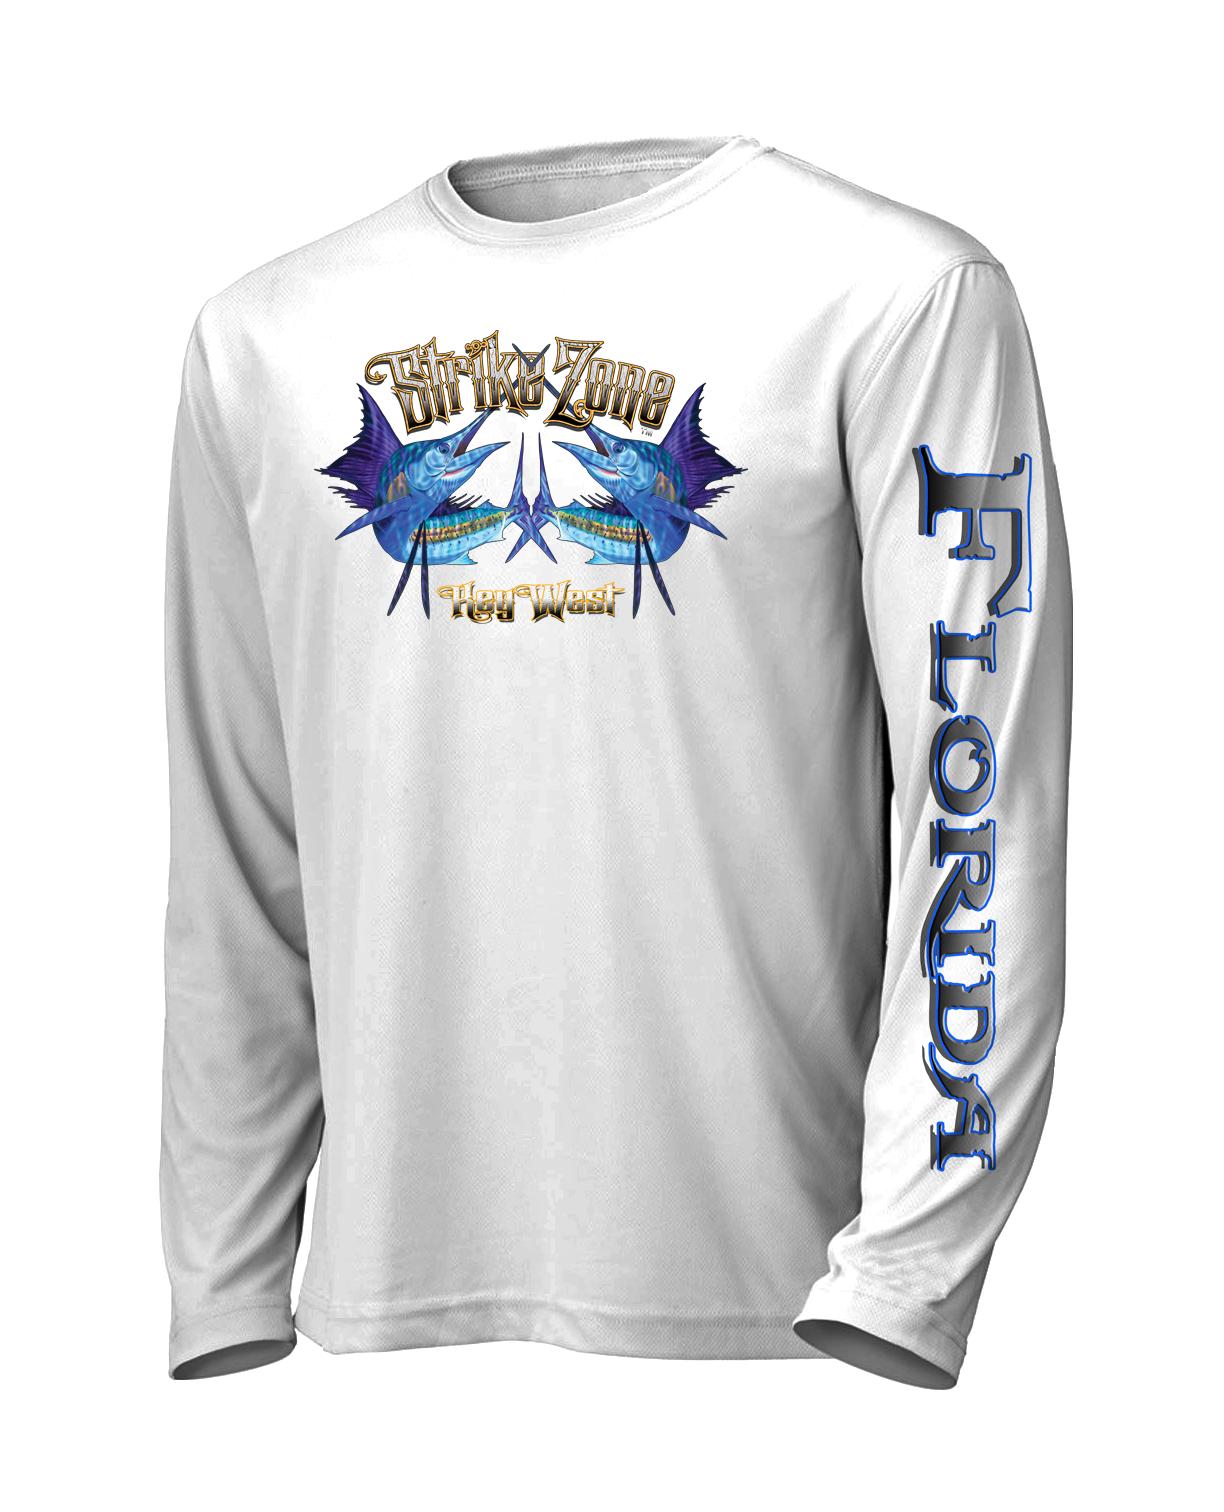 jason-mathias-strike-zone-offshore-slam-fishing-shirt-white-front.png